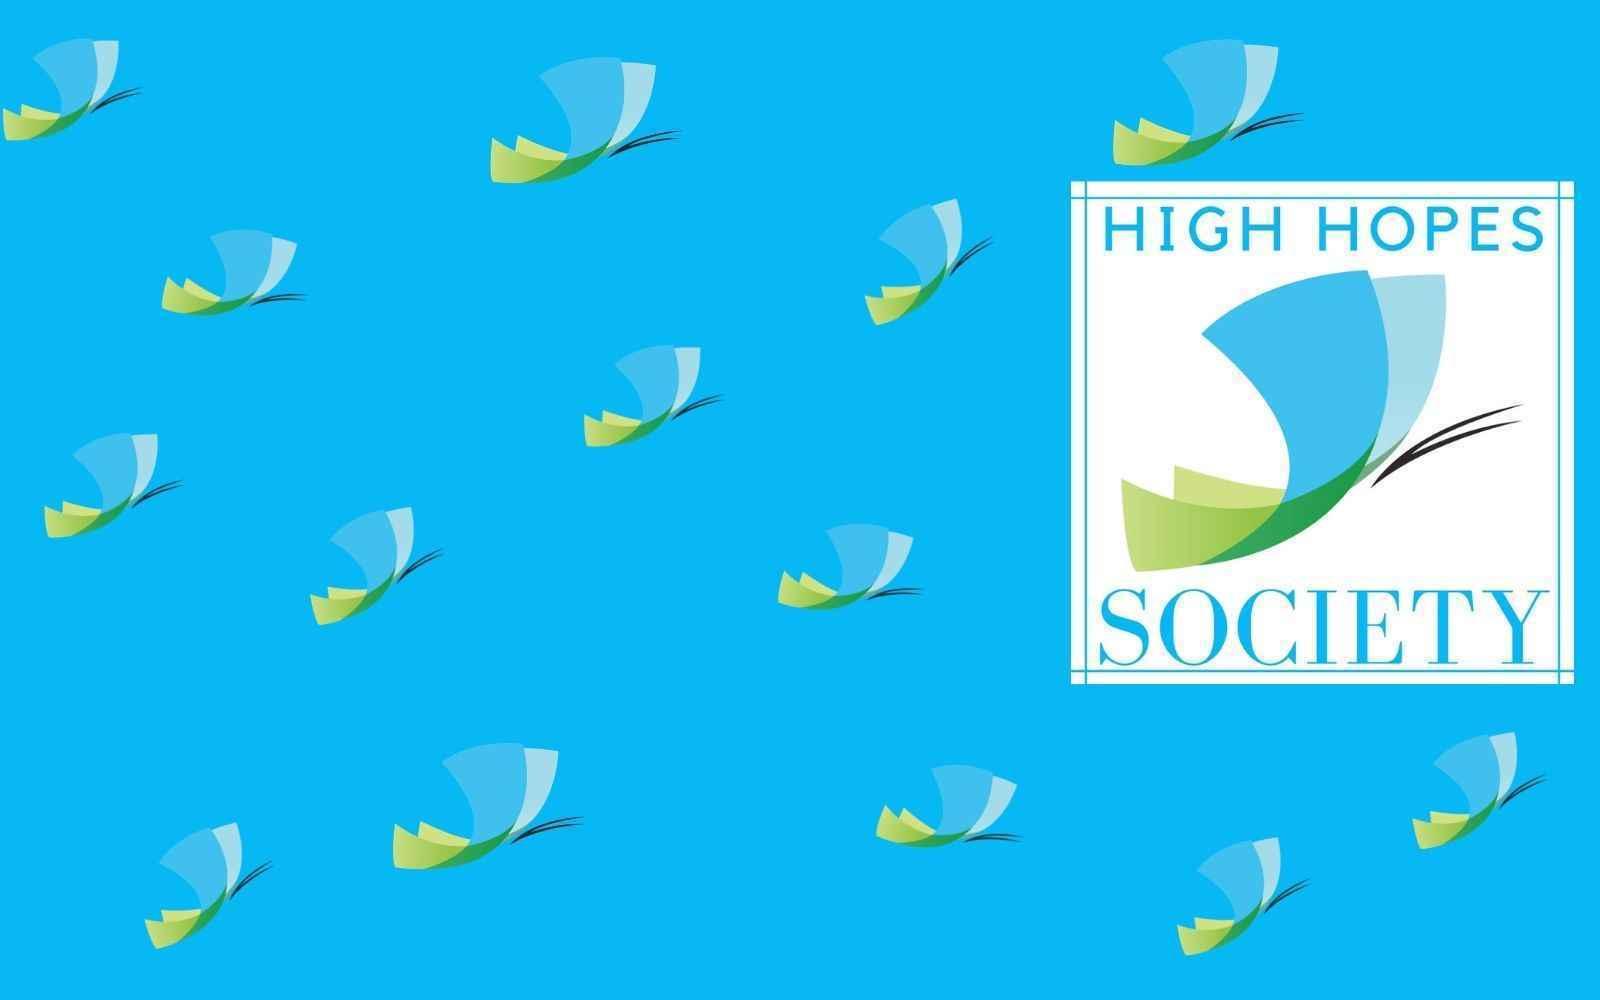 Join High Hopes Society image